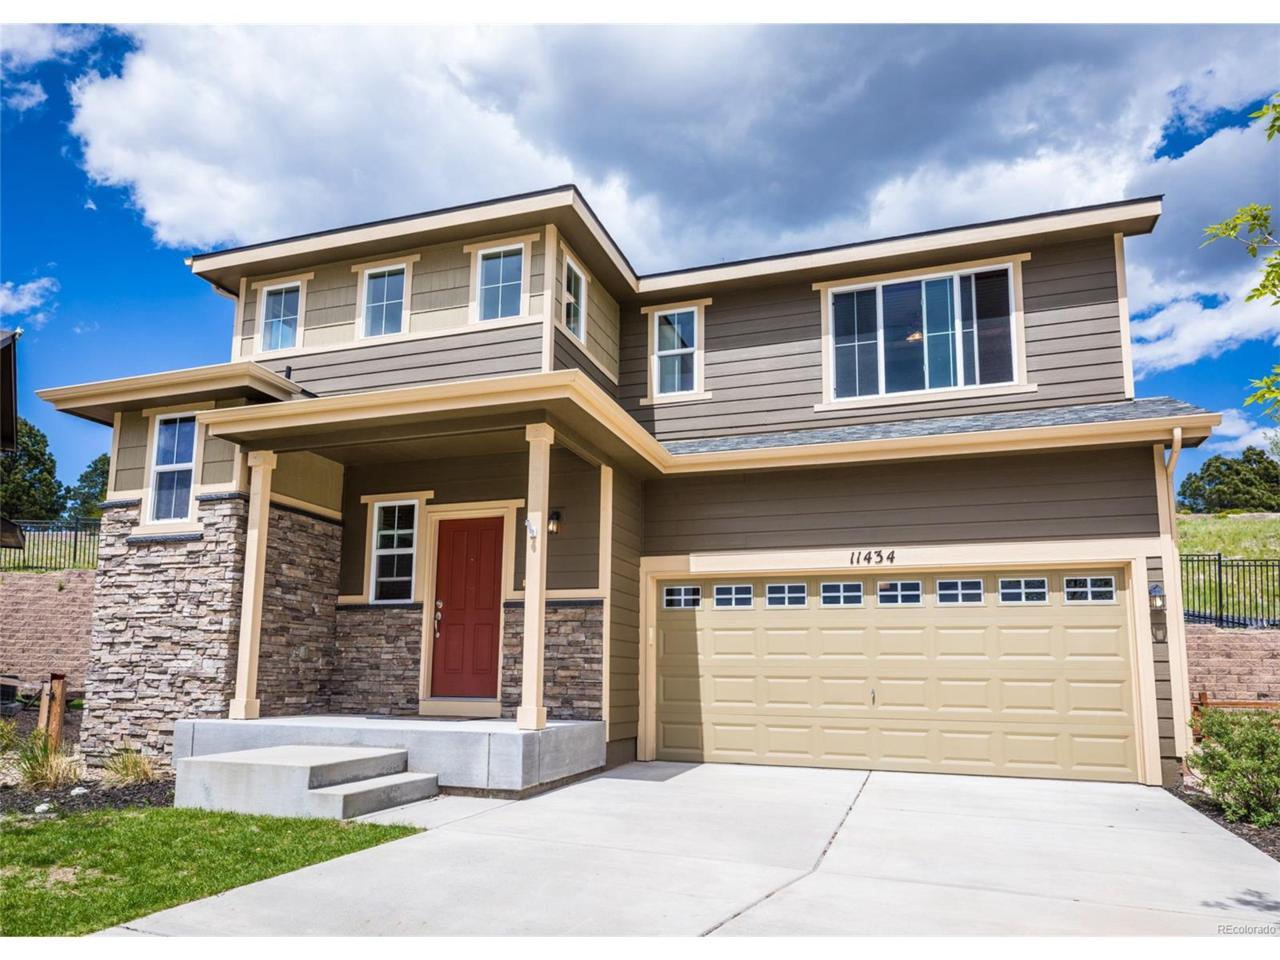 11434 Wildwood Ridge Drive, Colorado Springs, CO 80921 (MLS #9681807) :: 8z Real Estate